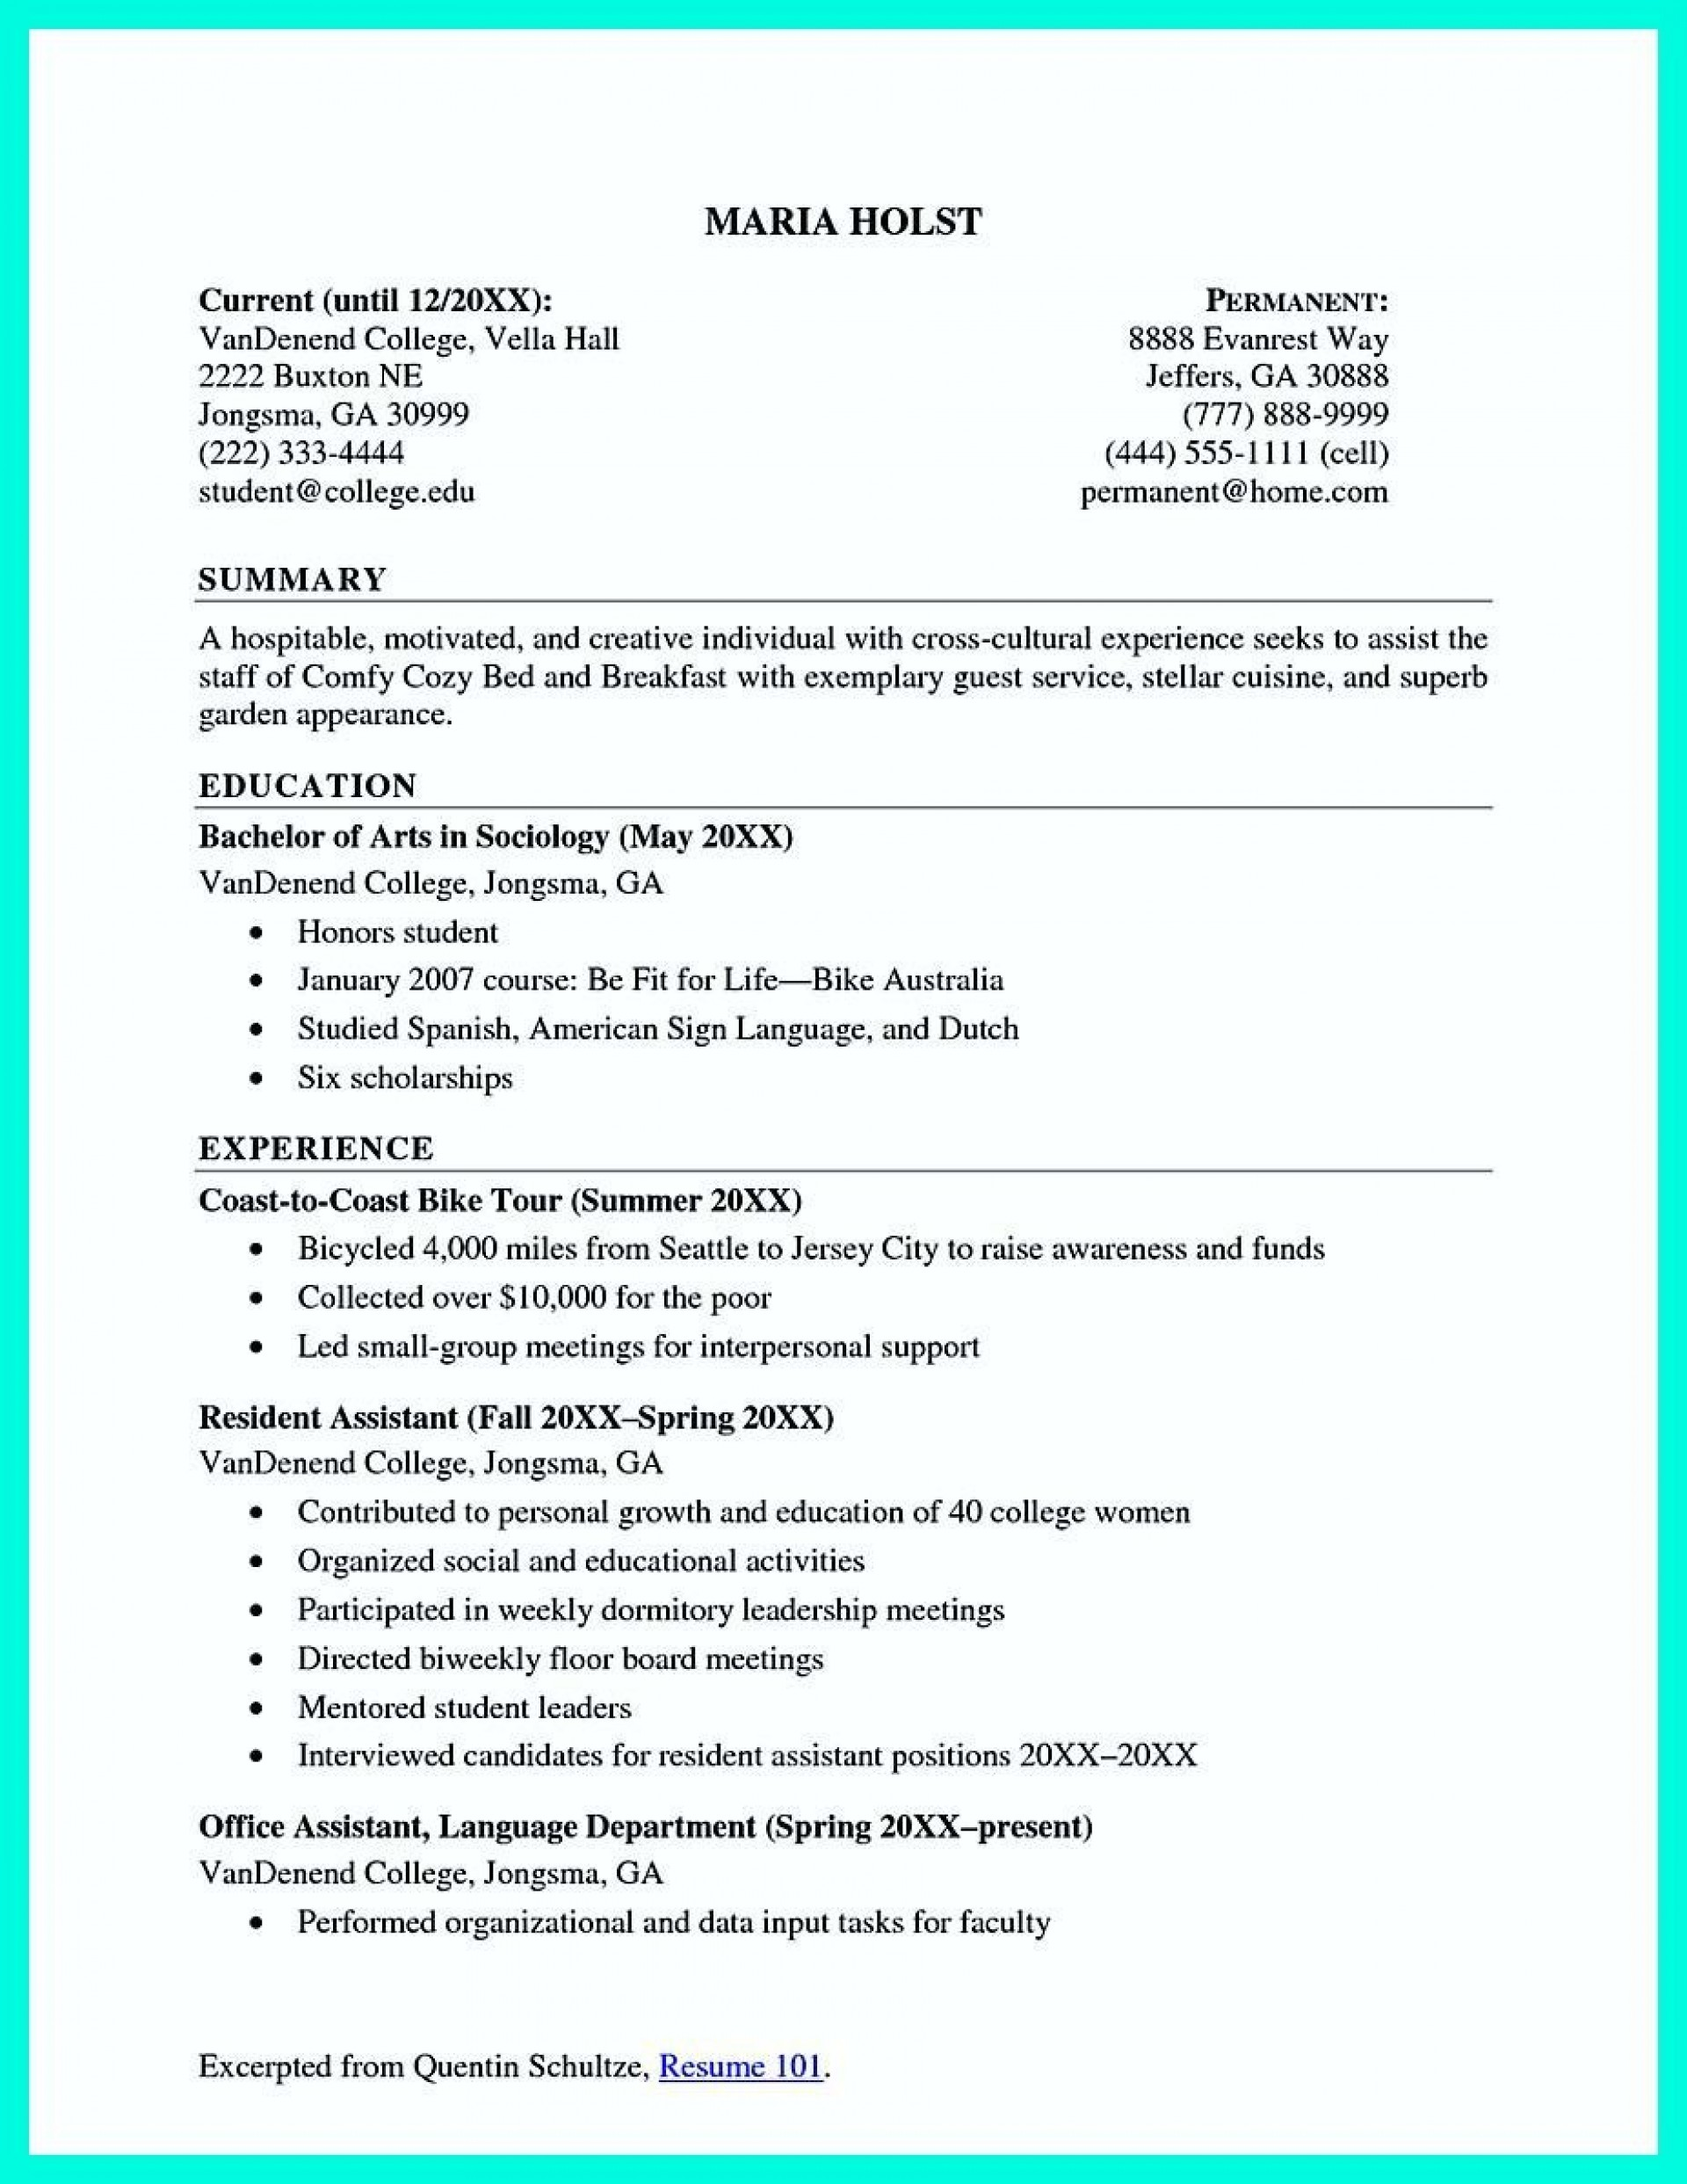 002 Beautiful Recent College Graduate Resume Template Image  Word1920